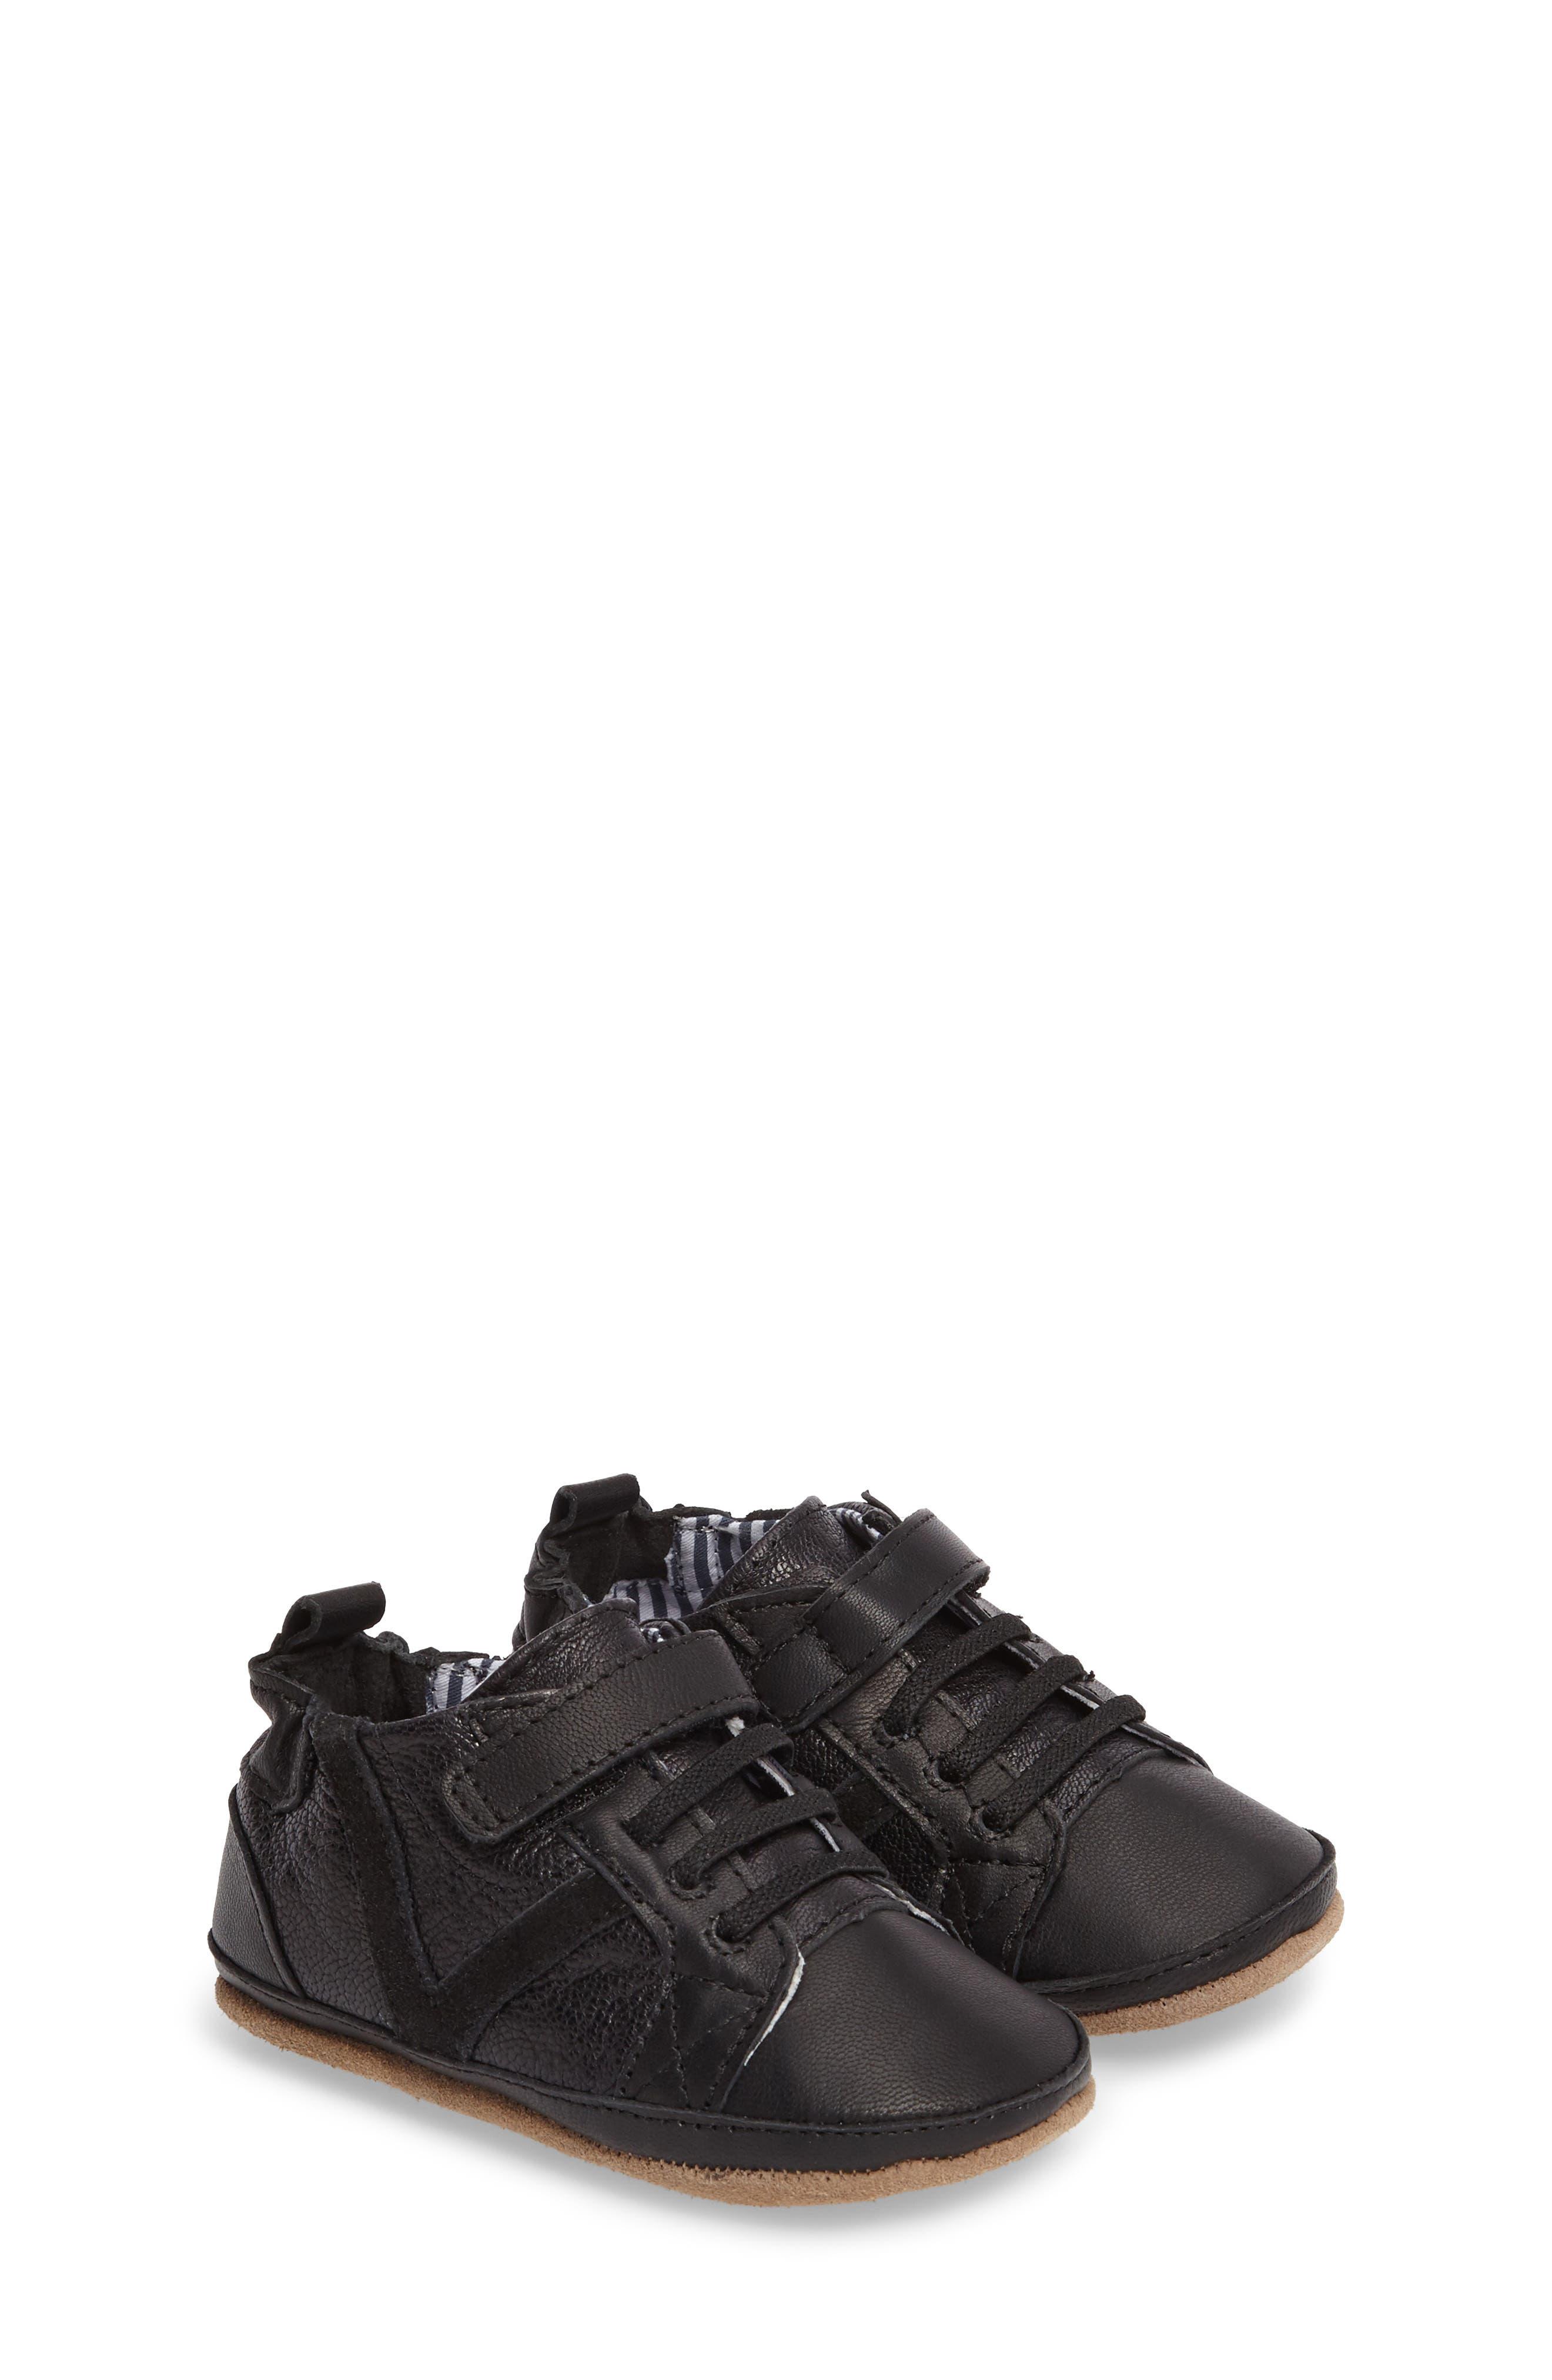 Main Image - Robeez® Asher Crib Shoe (Baby & Walker)